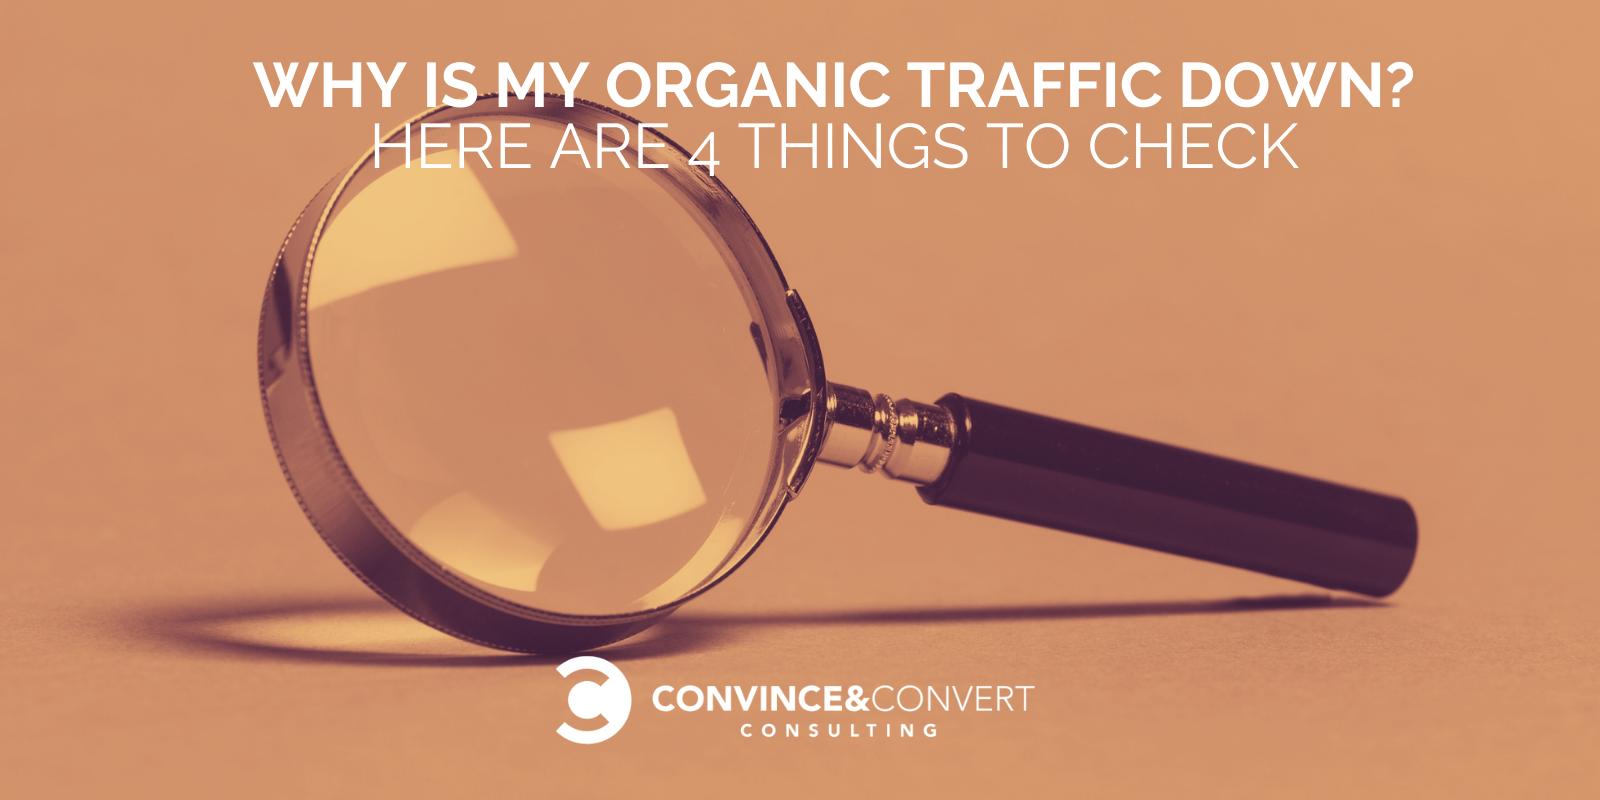 Why is my organic traffic down